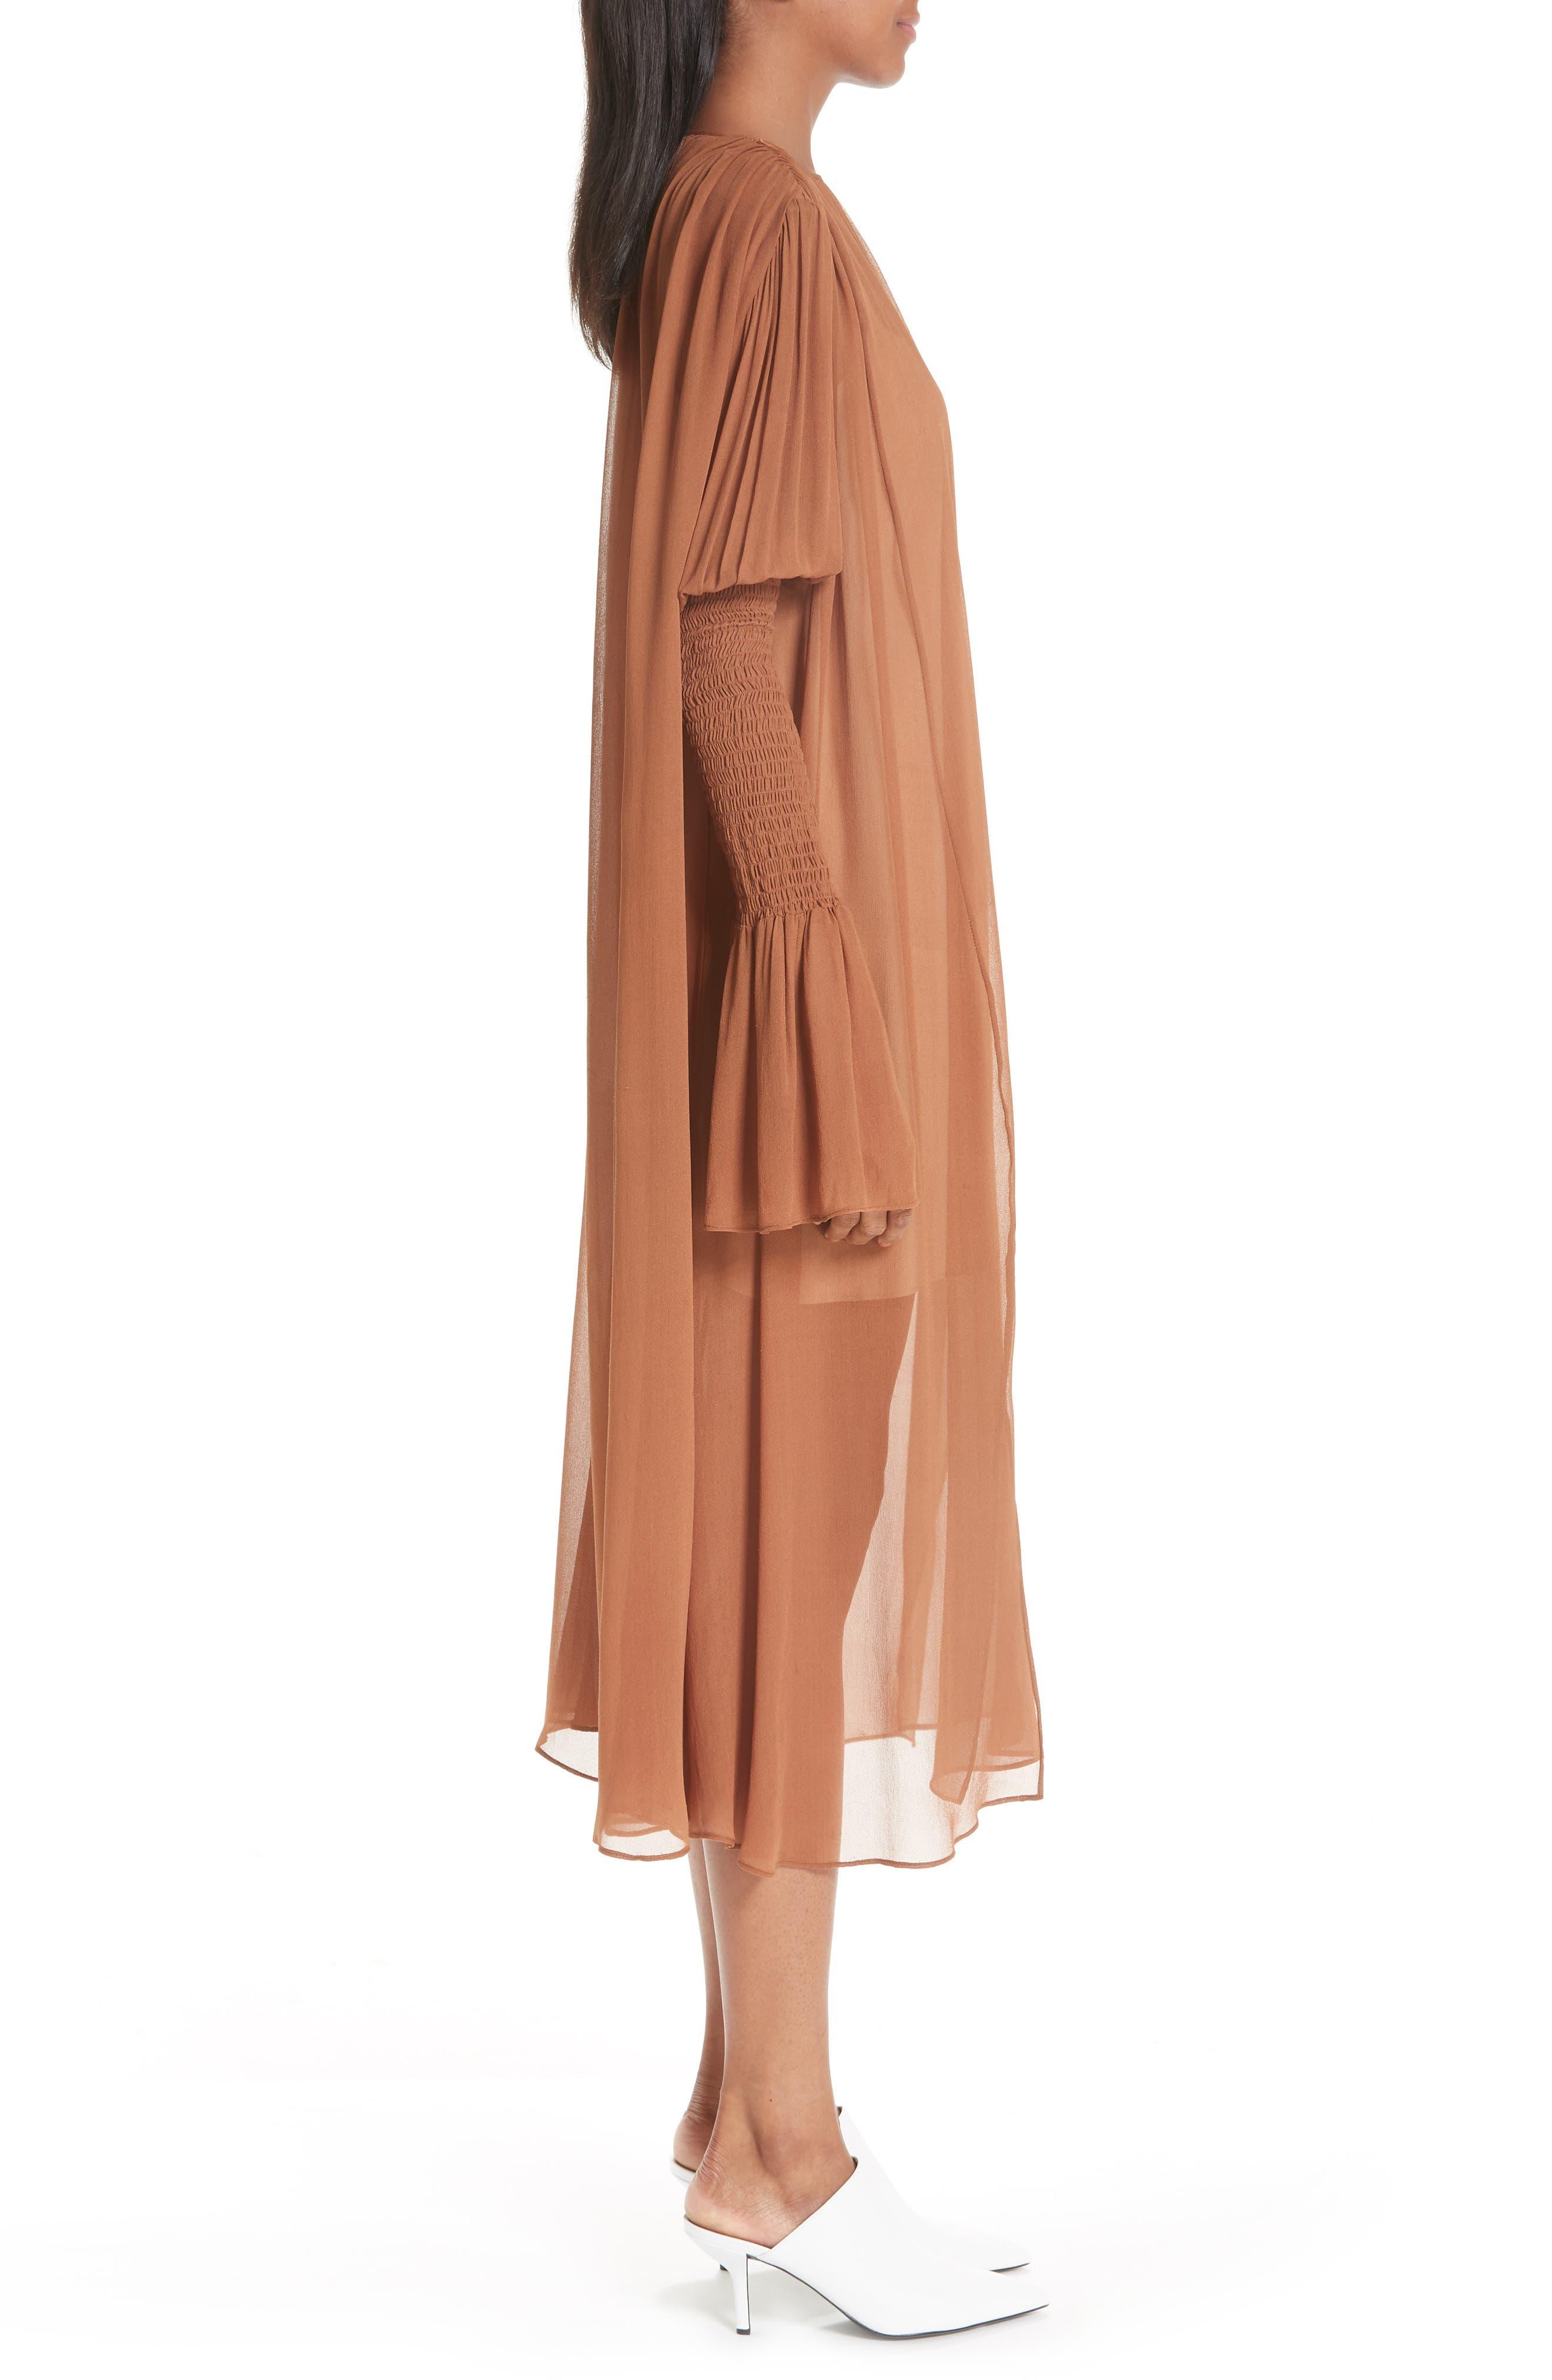 CIENNE,                             The Costa Silk Dress,                             Alternate thumbnail 3, color,                             200